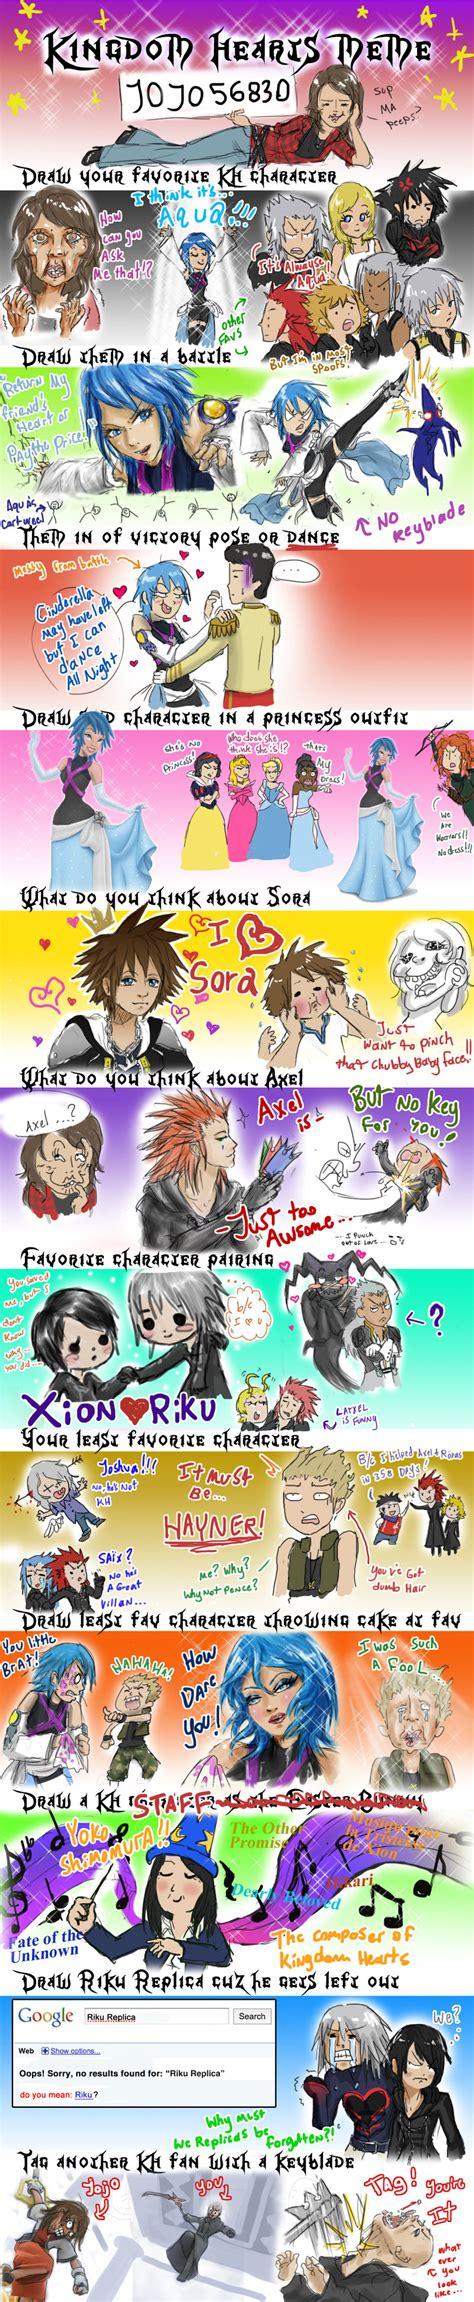 Kingdom Hearts Memes - kingdom hearts meme by jojo56830 on deviantart